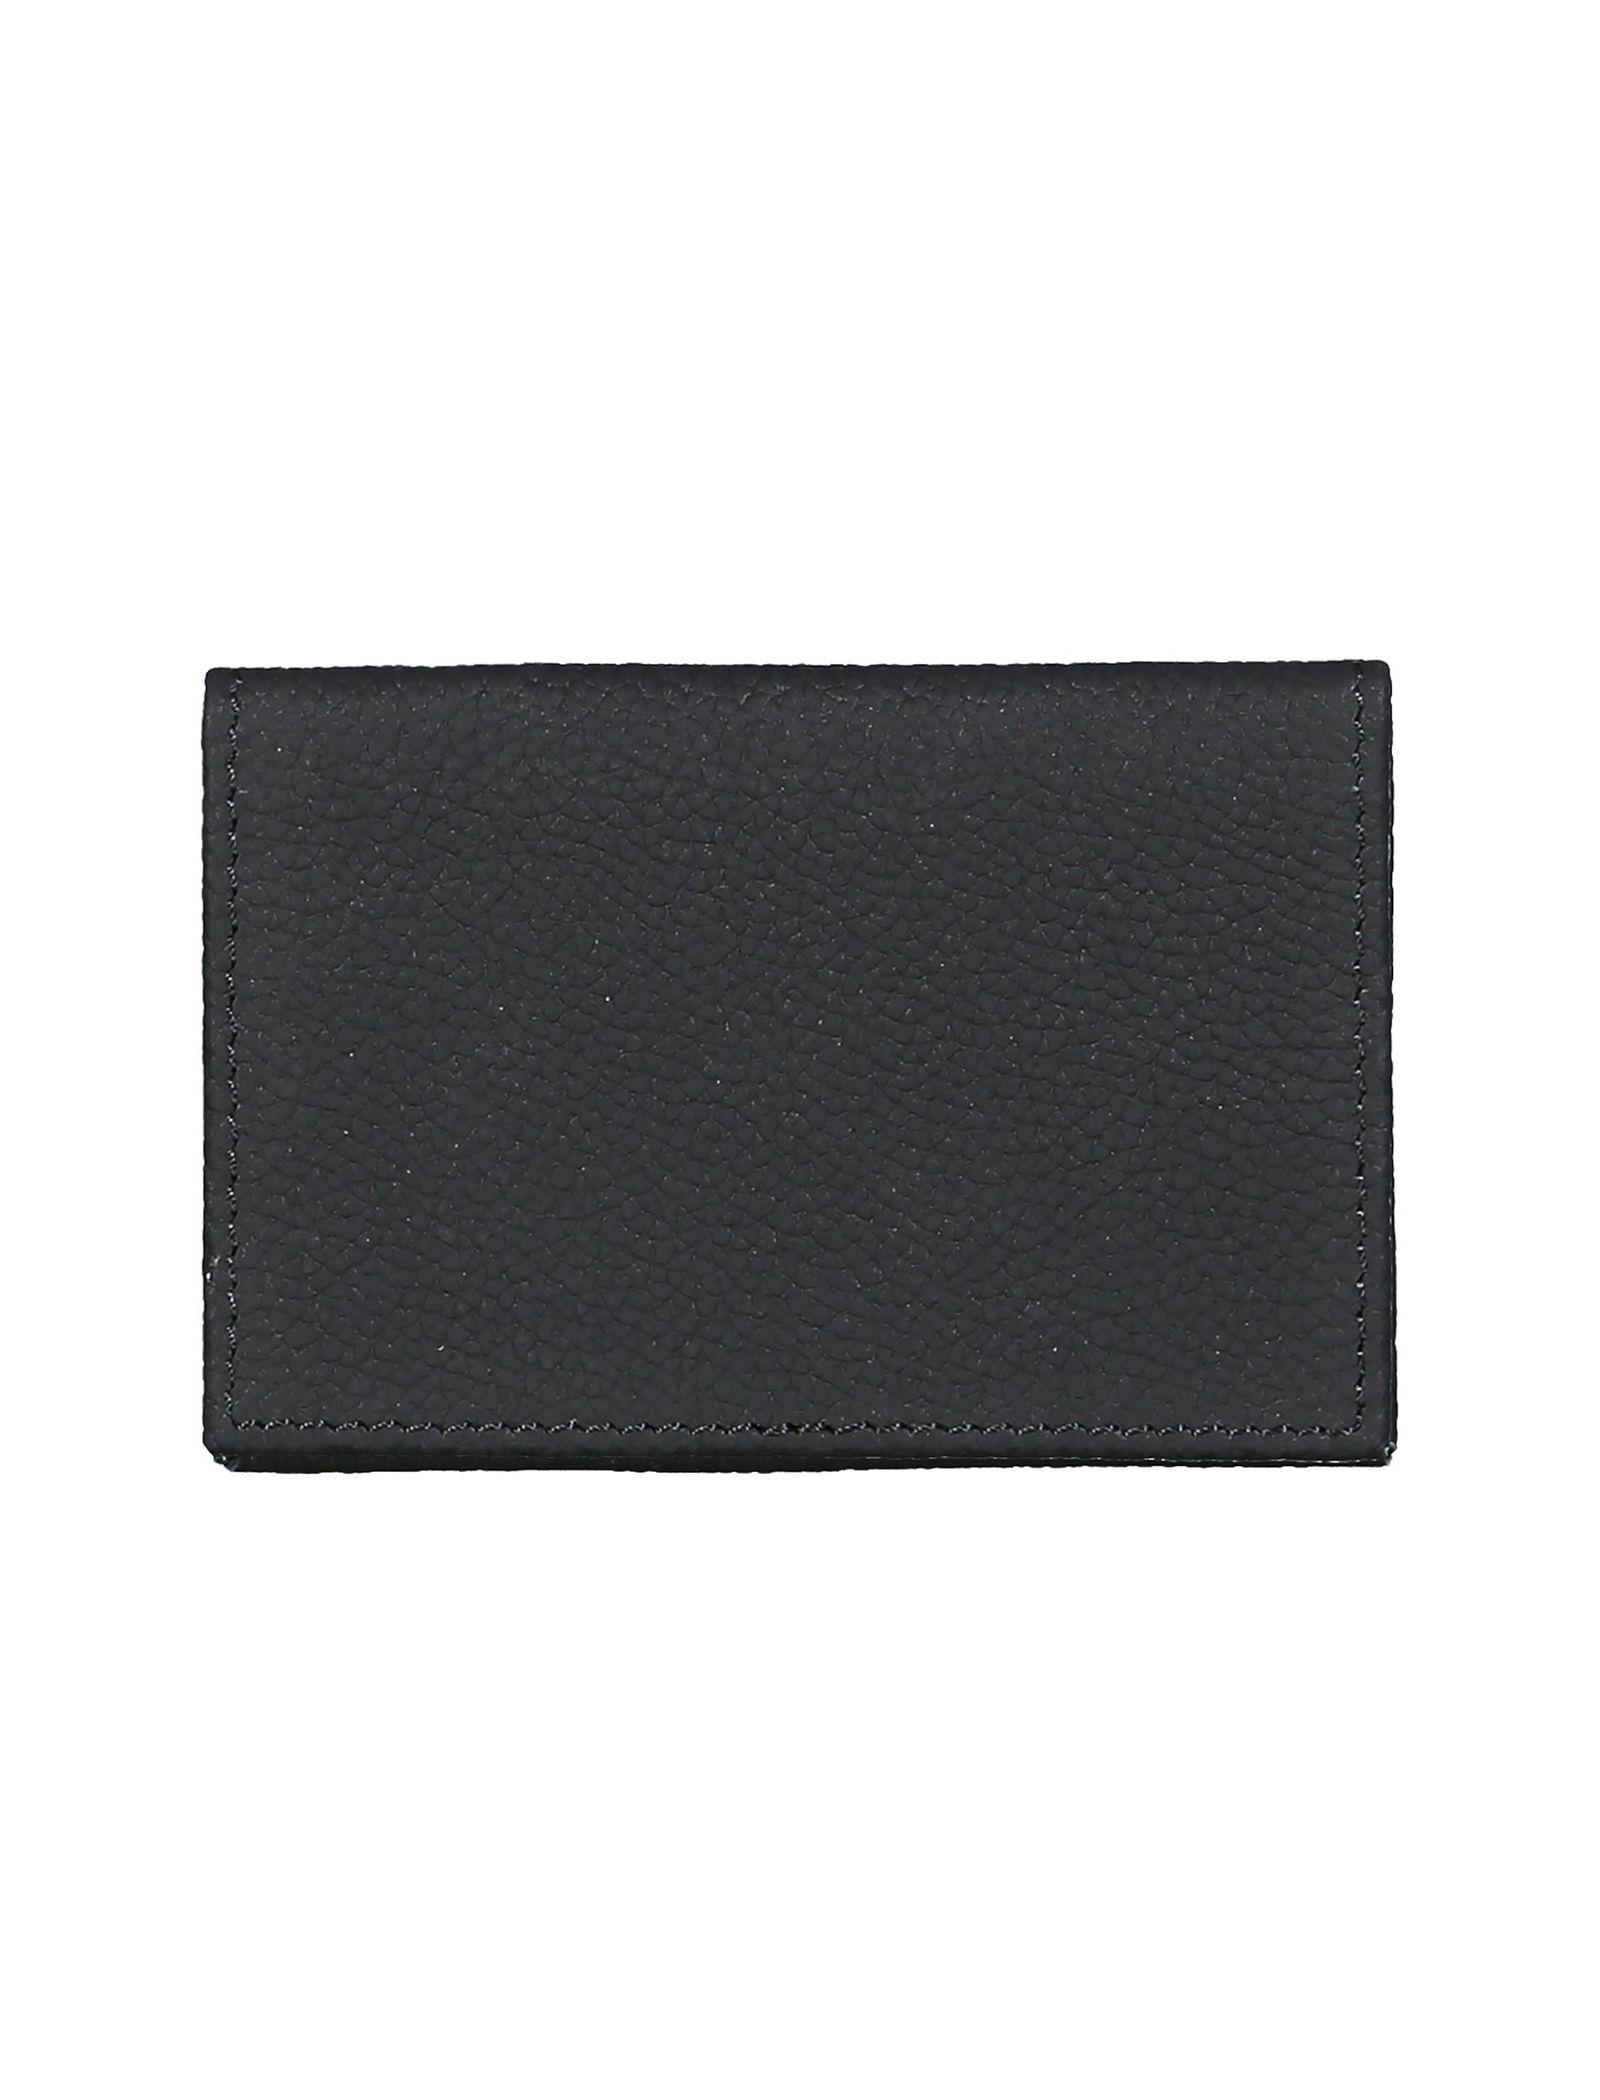 کیف کارت بزرگسال - یونیتی - مشکي - 2